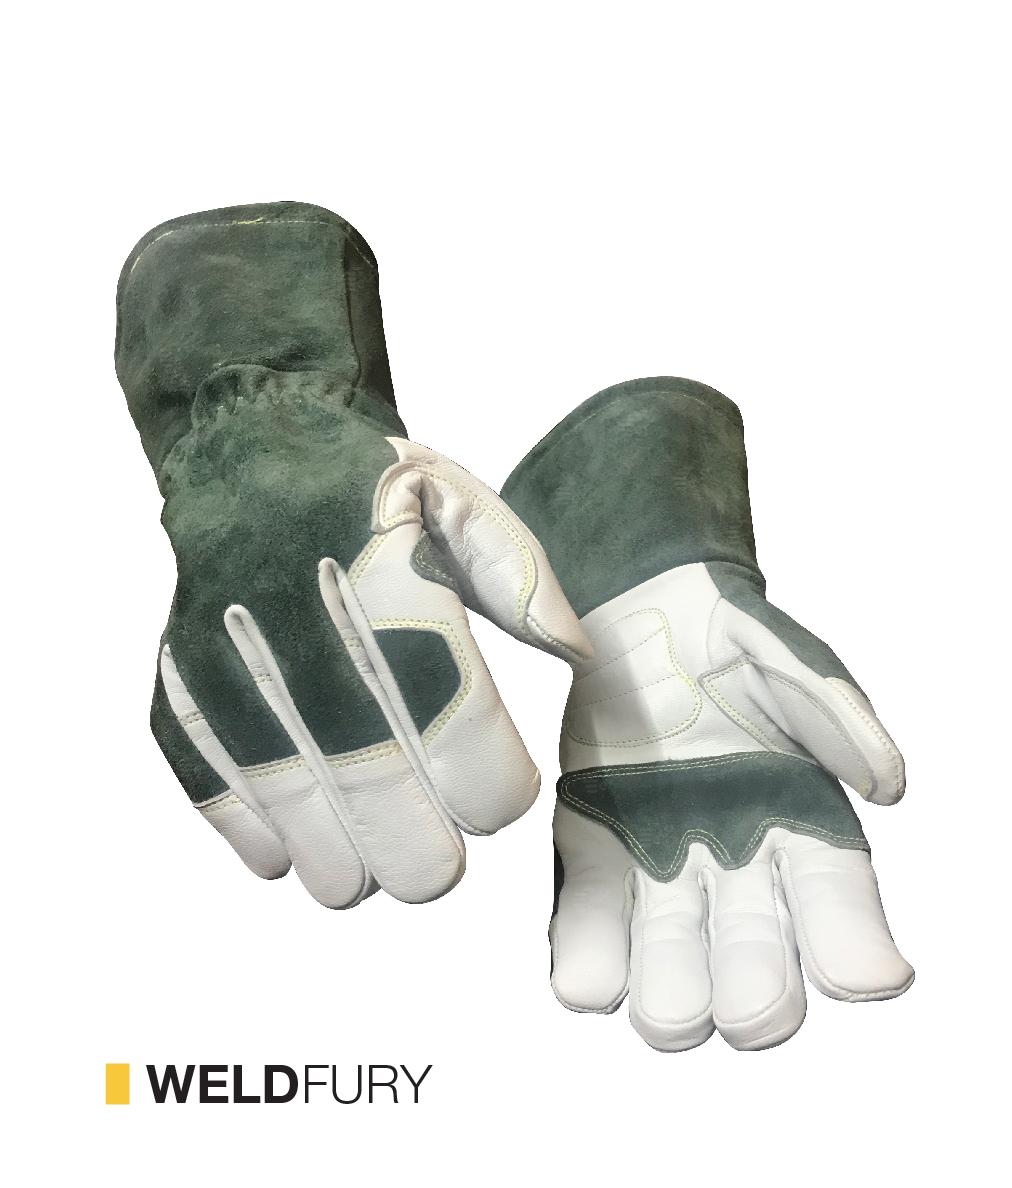 WELDFURY cut-resistant gloves by elite leather